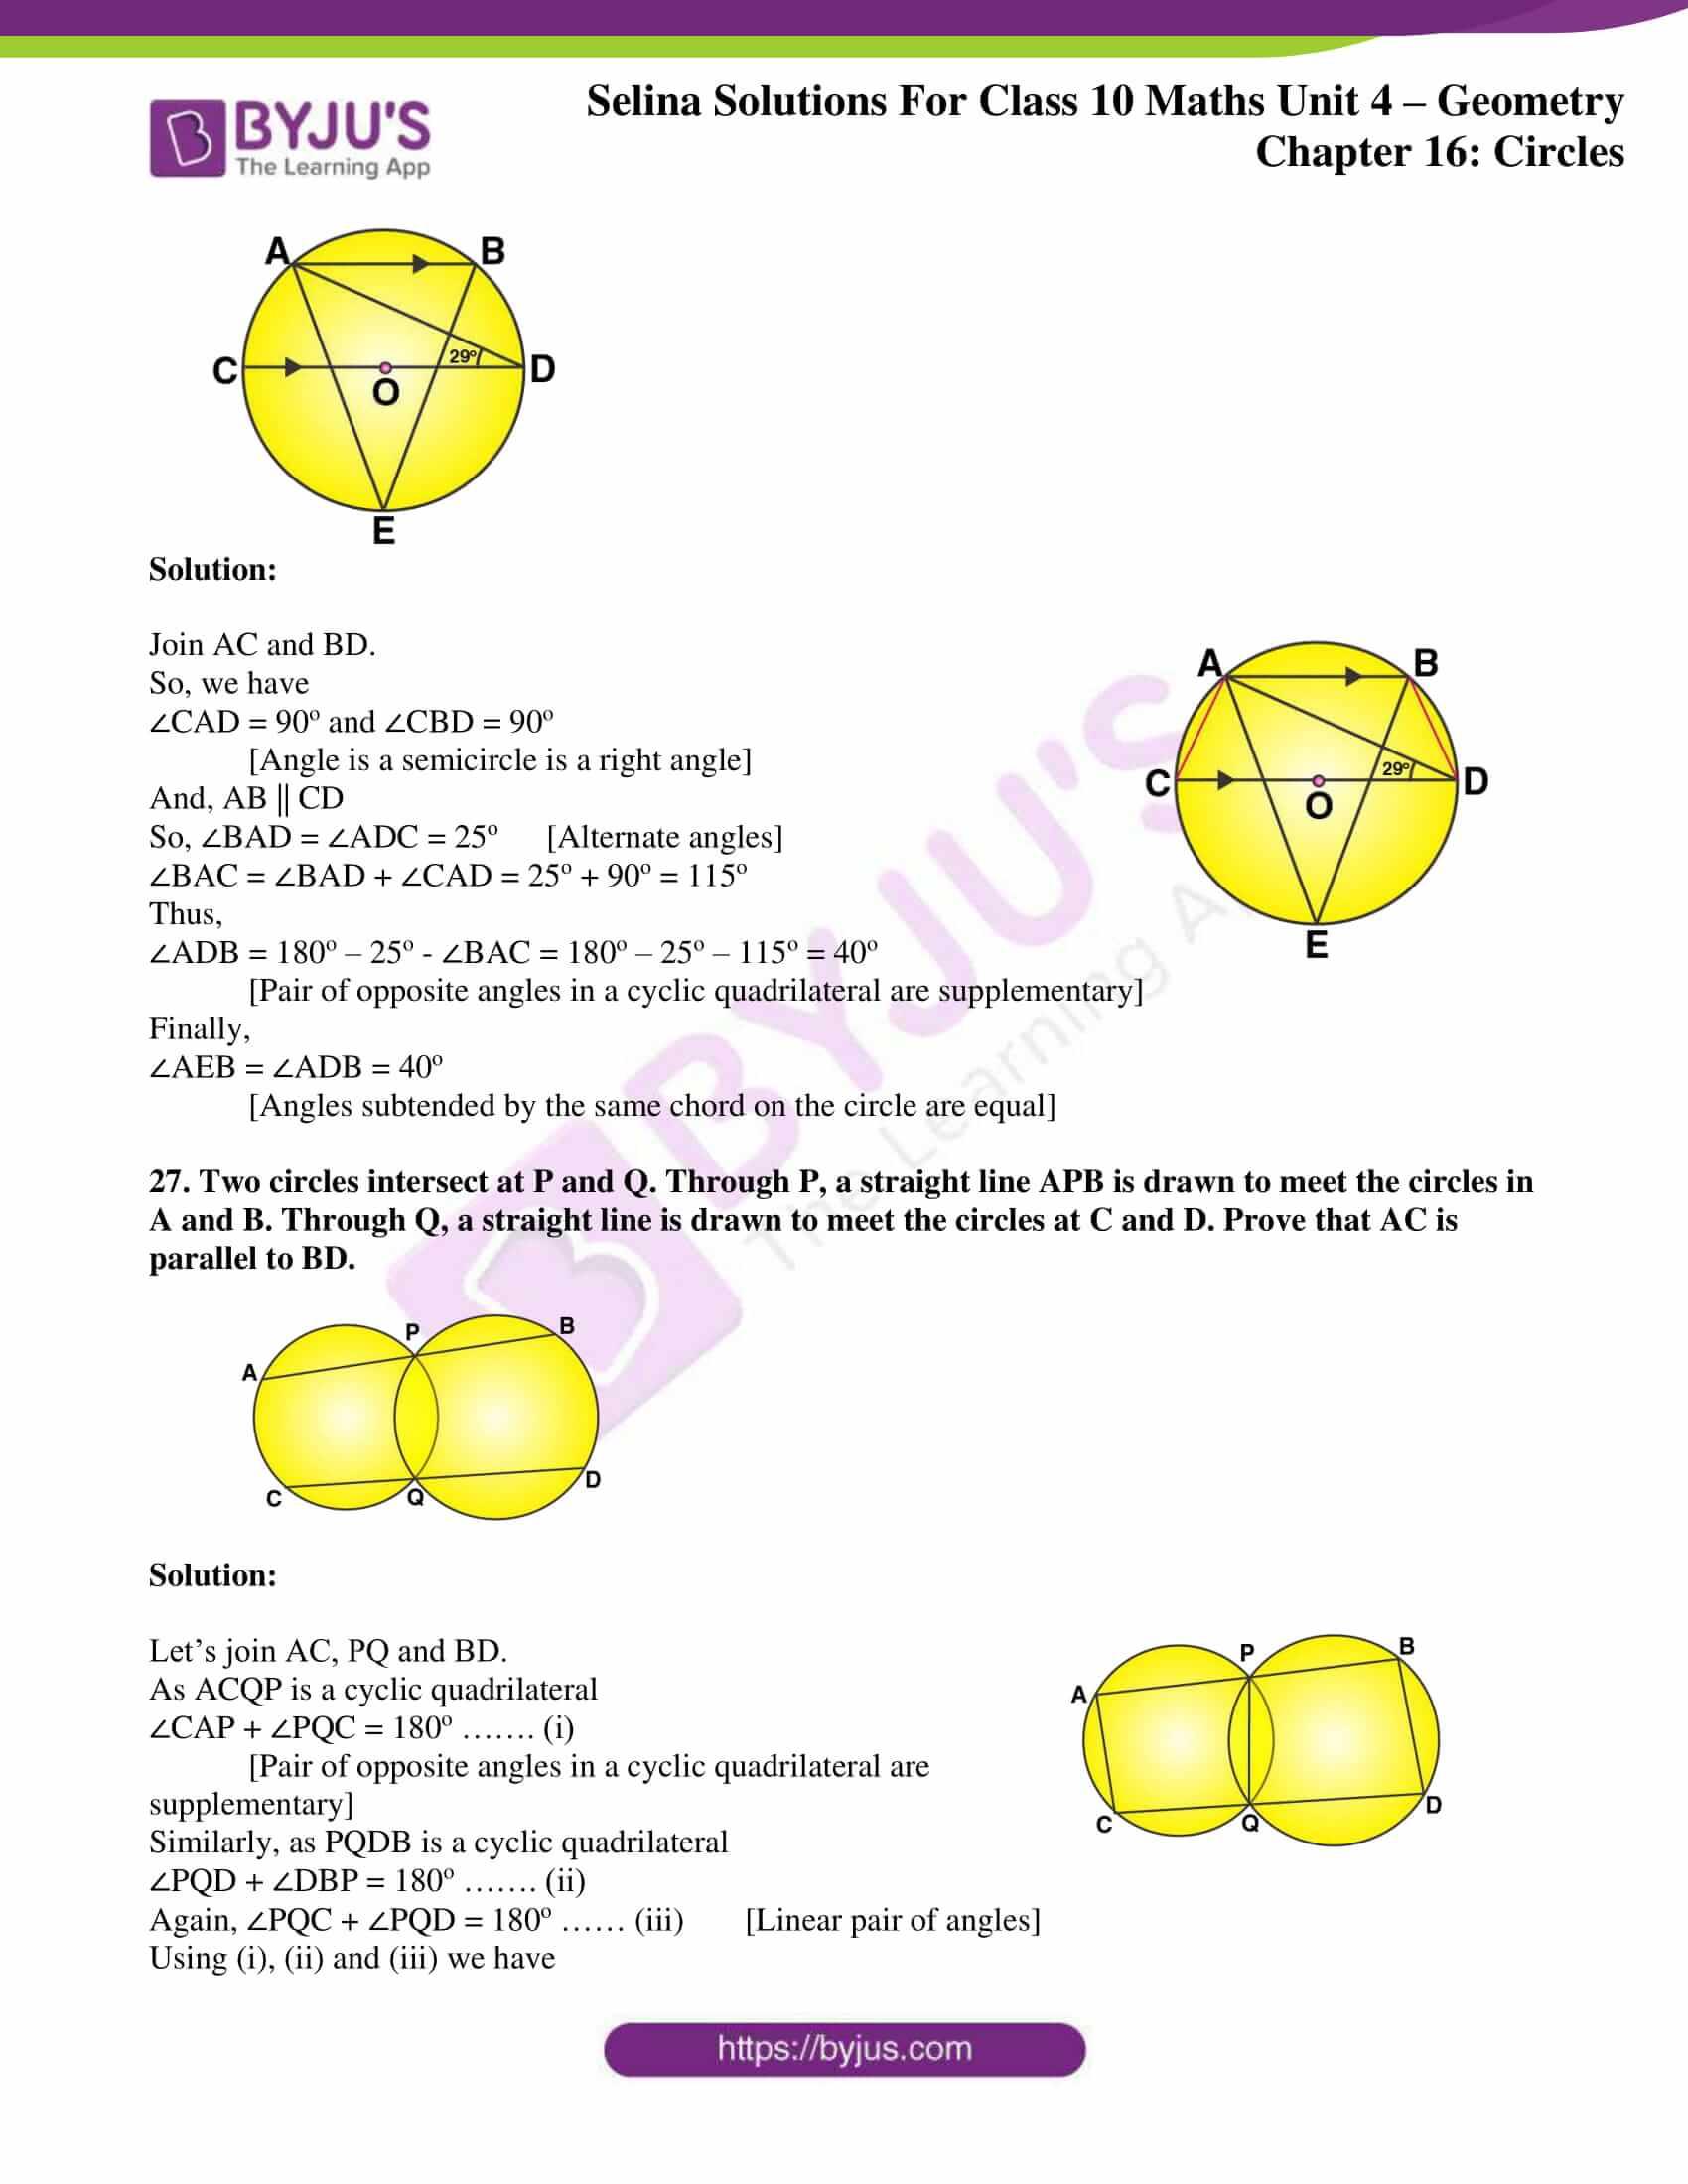 selina-sol-maths-class-10-ch-17-ex-a-15